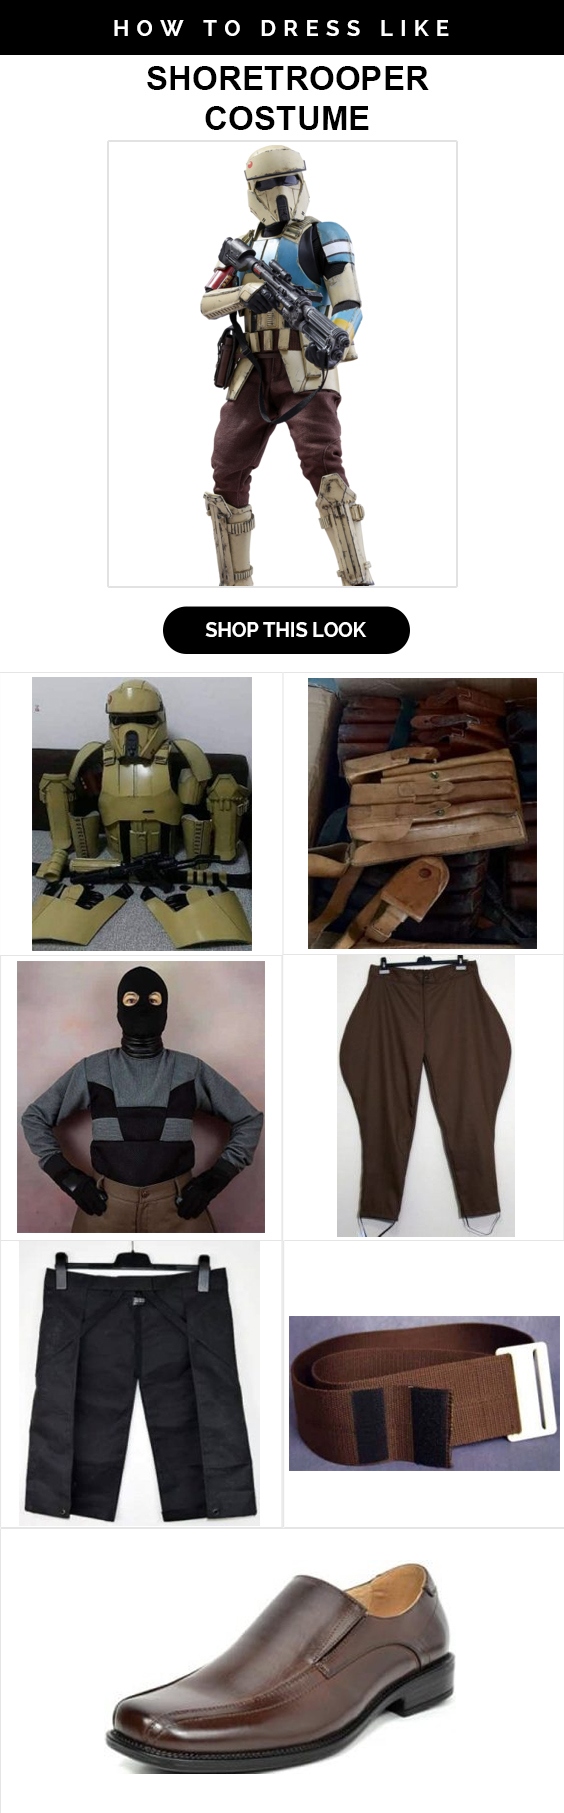 star wars Shoretrooper costume